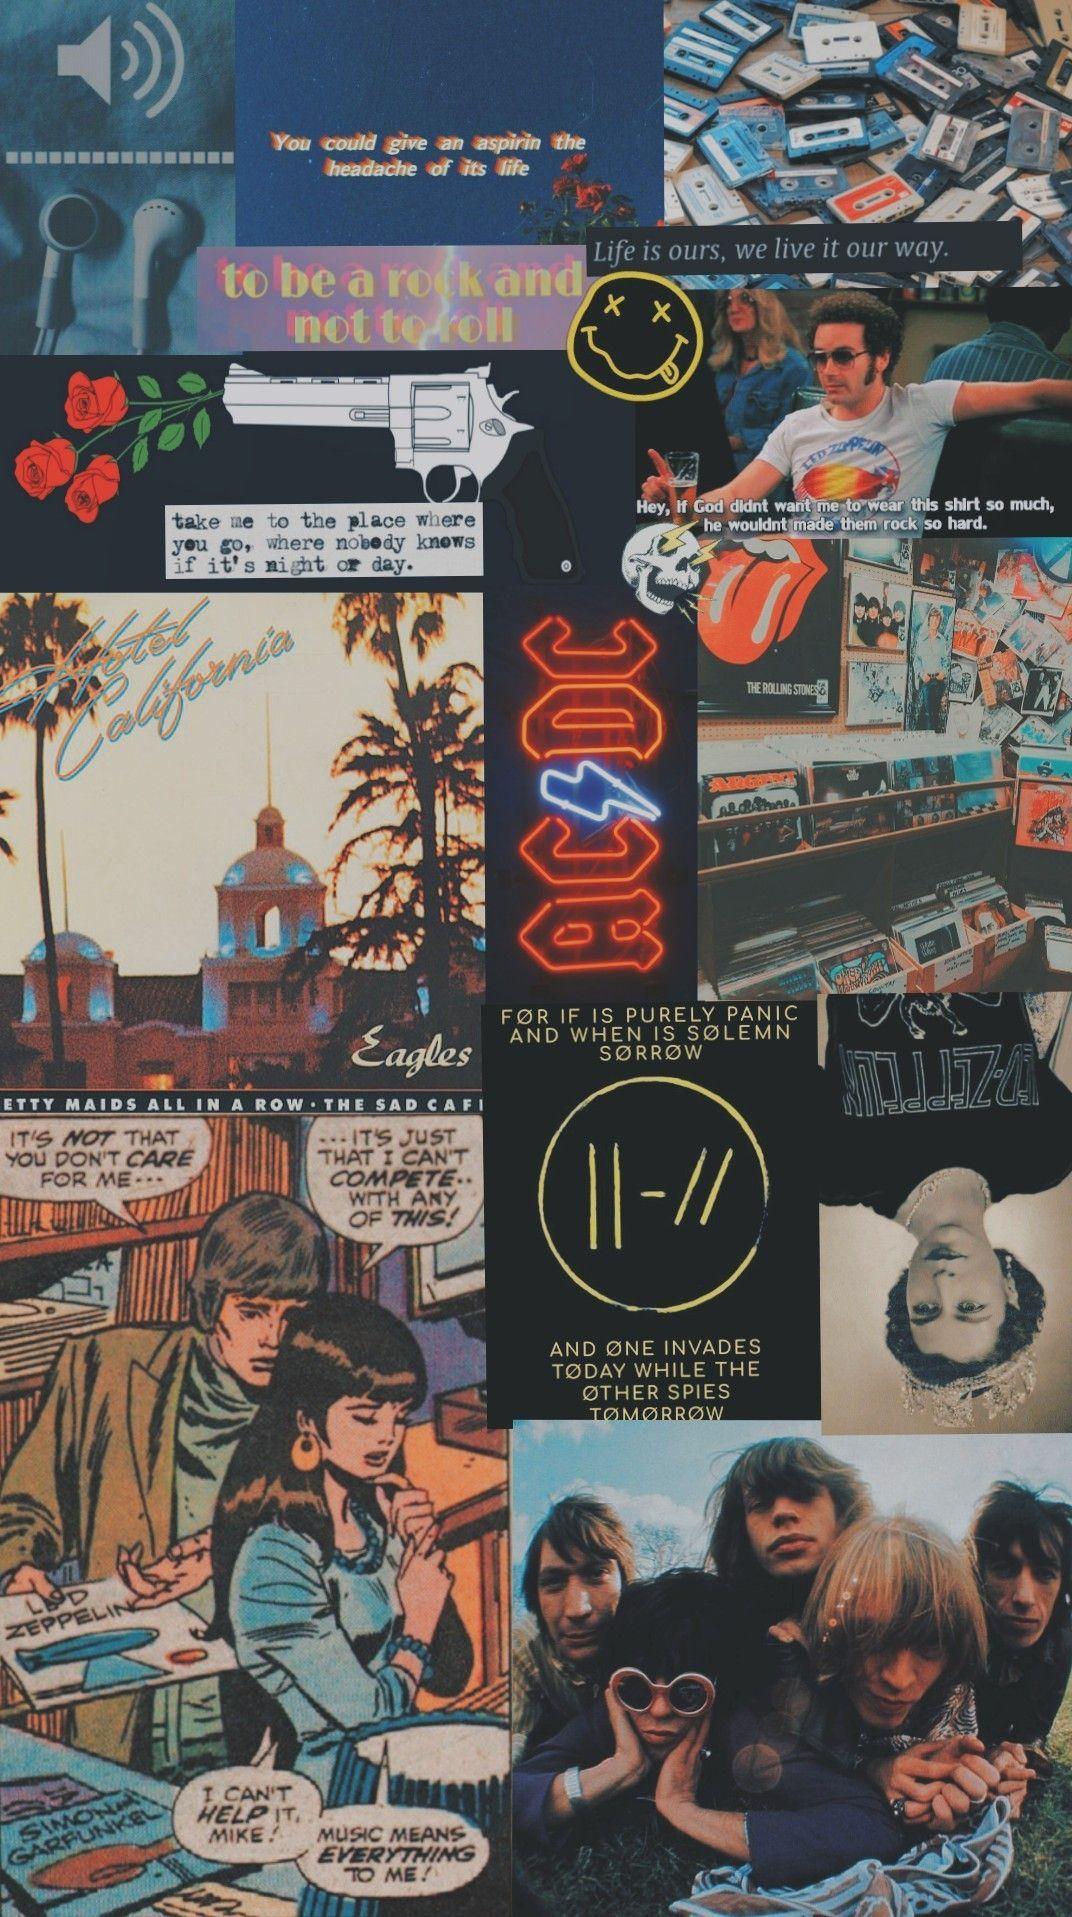 Rock and roll, twenty one pilots, Oasis, Led Zeppelin